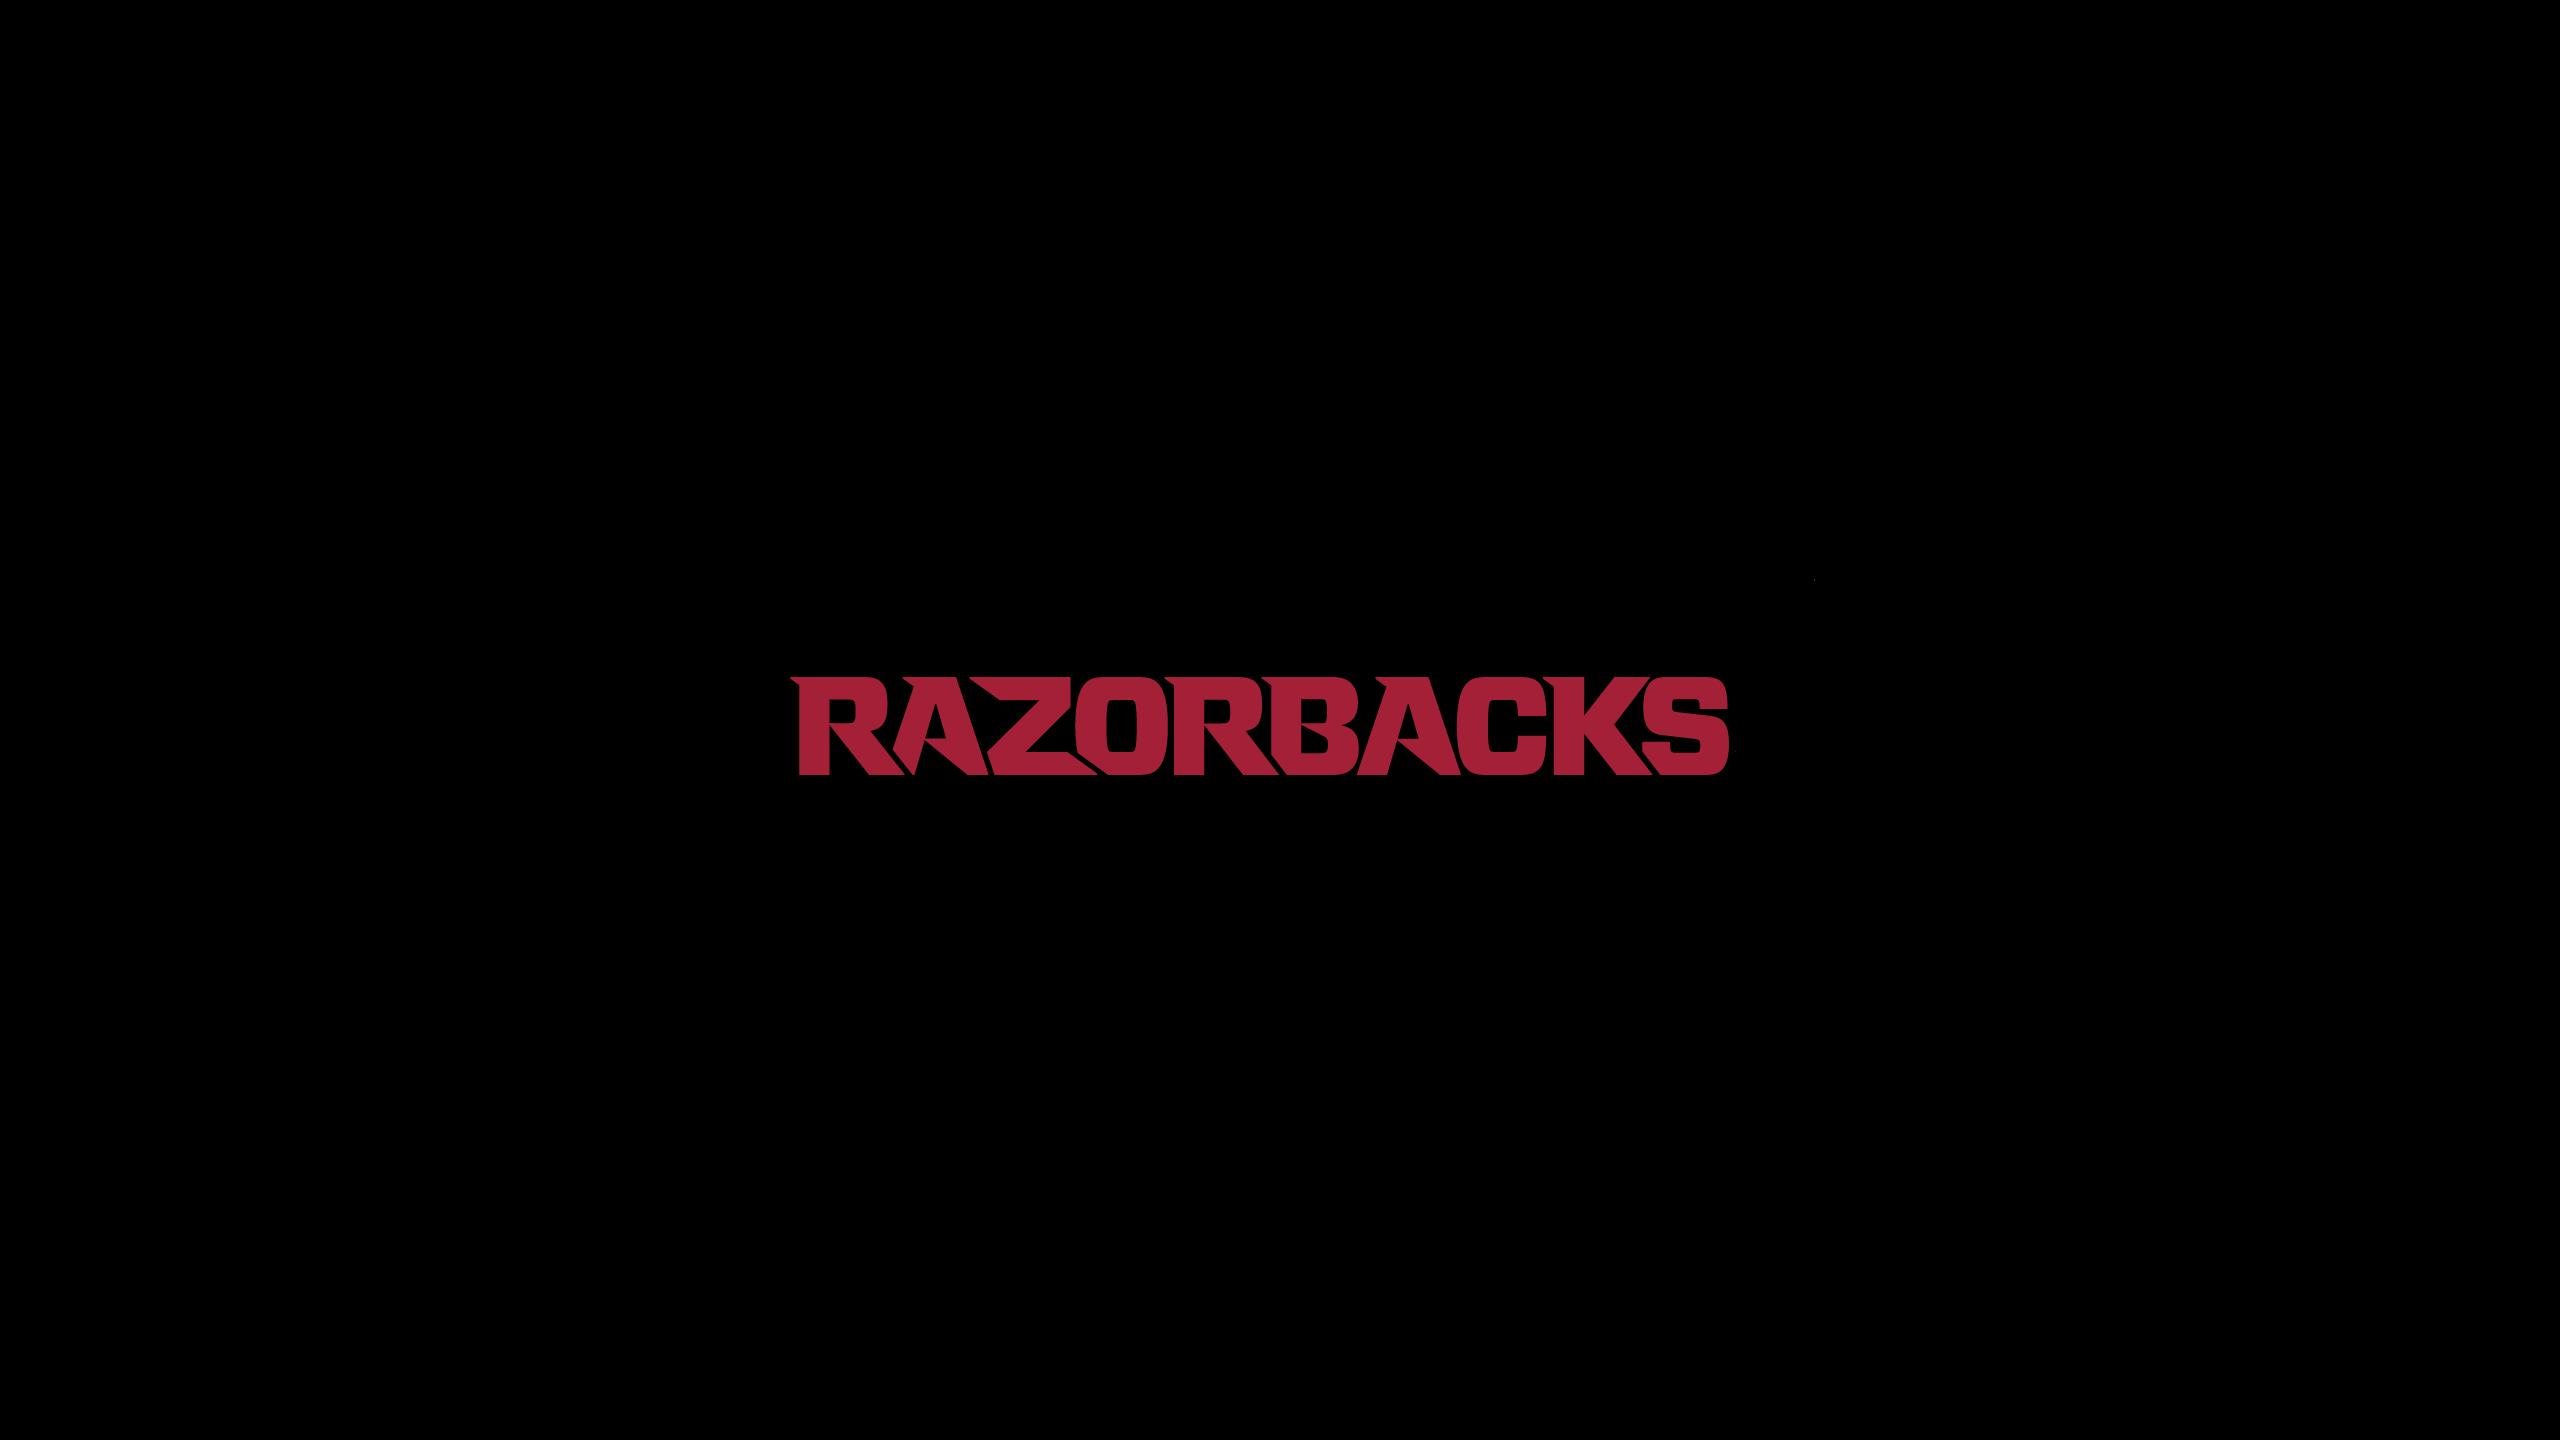 University of Arkansas Razorbacks